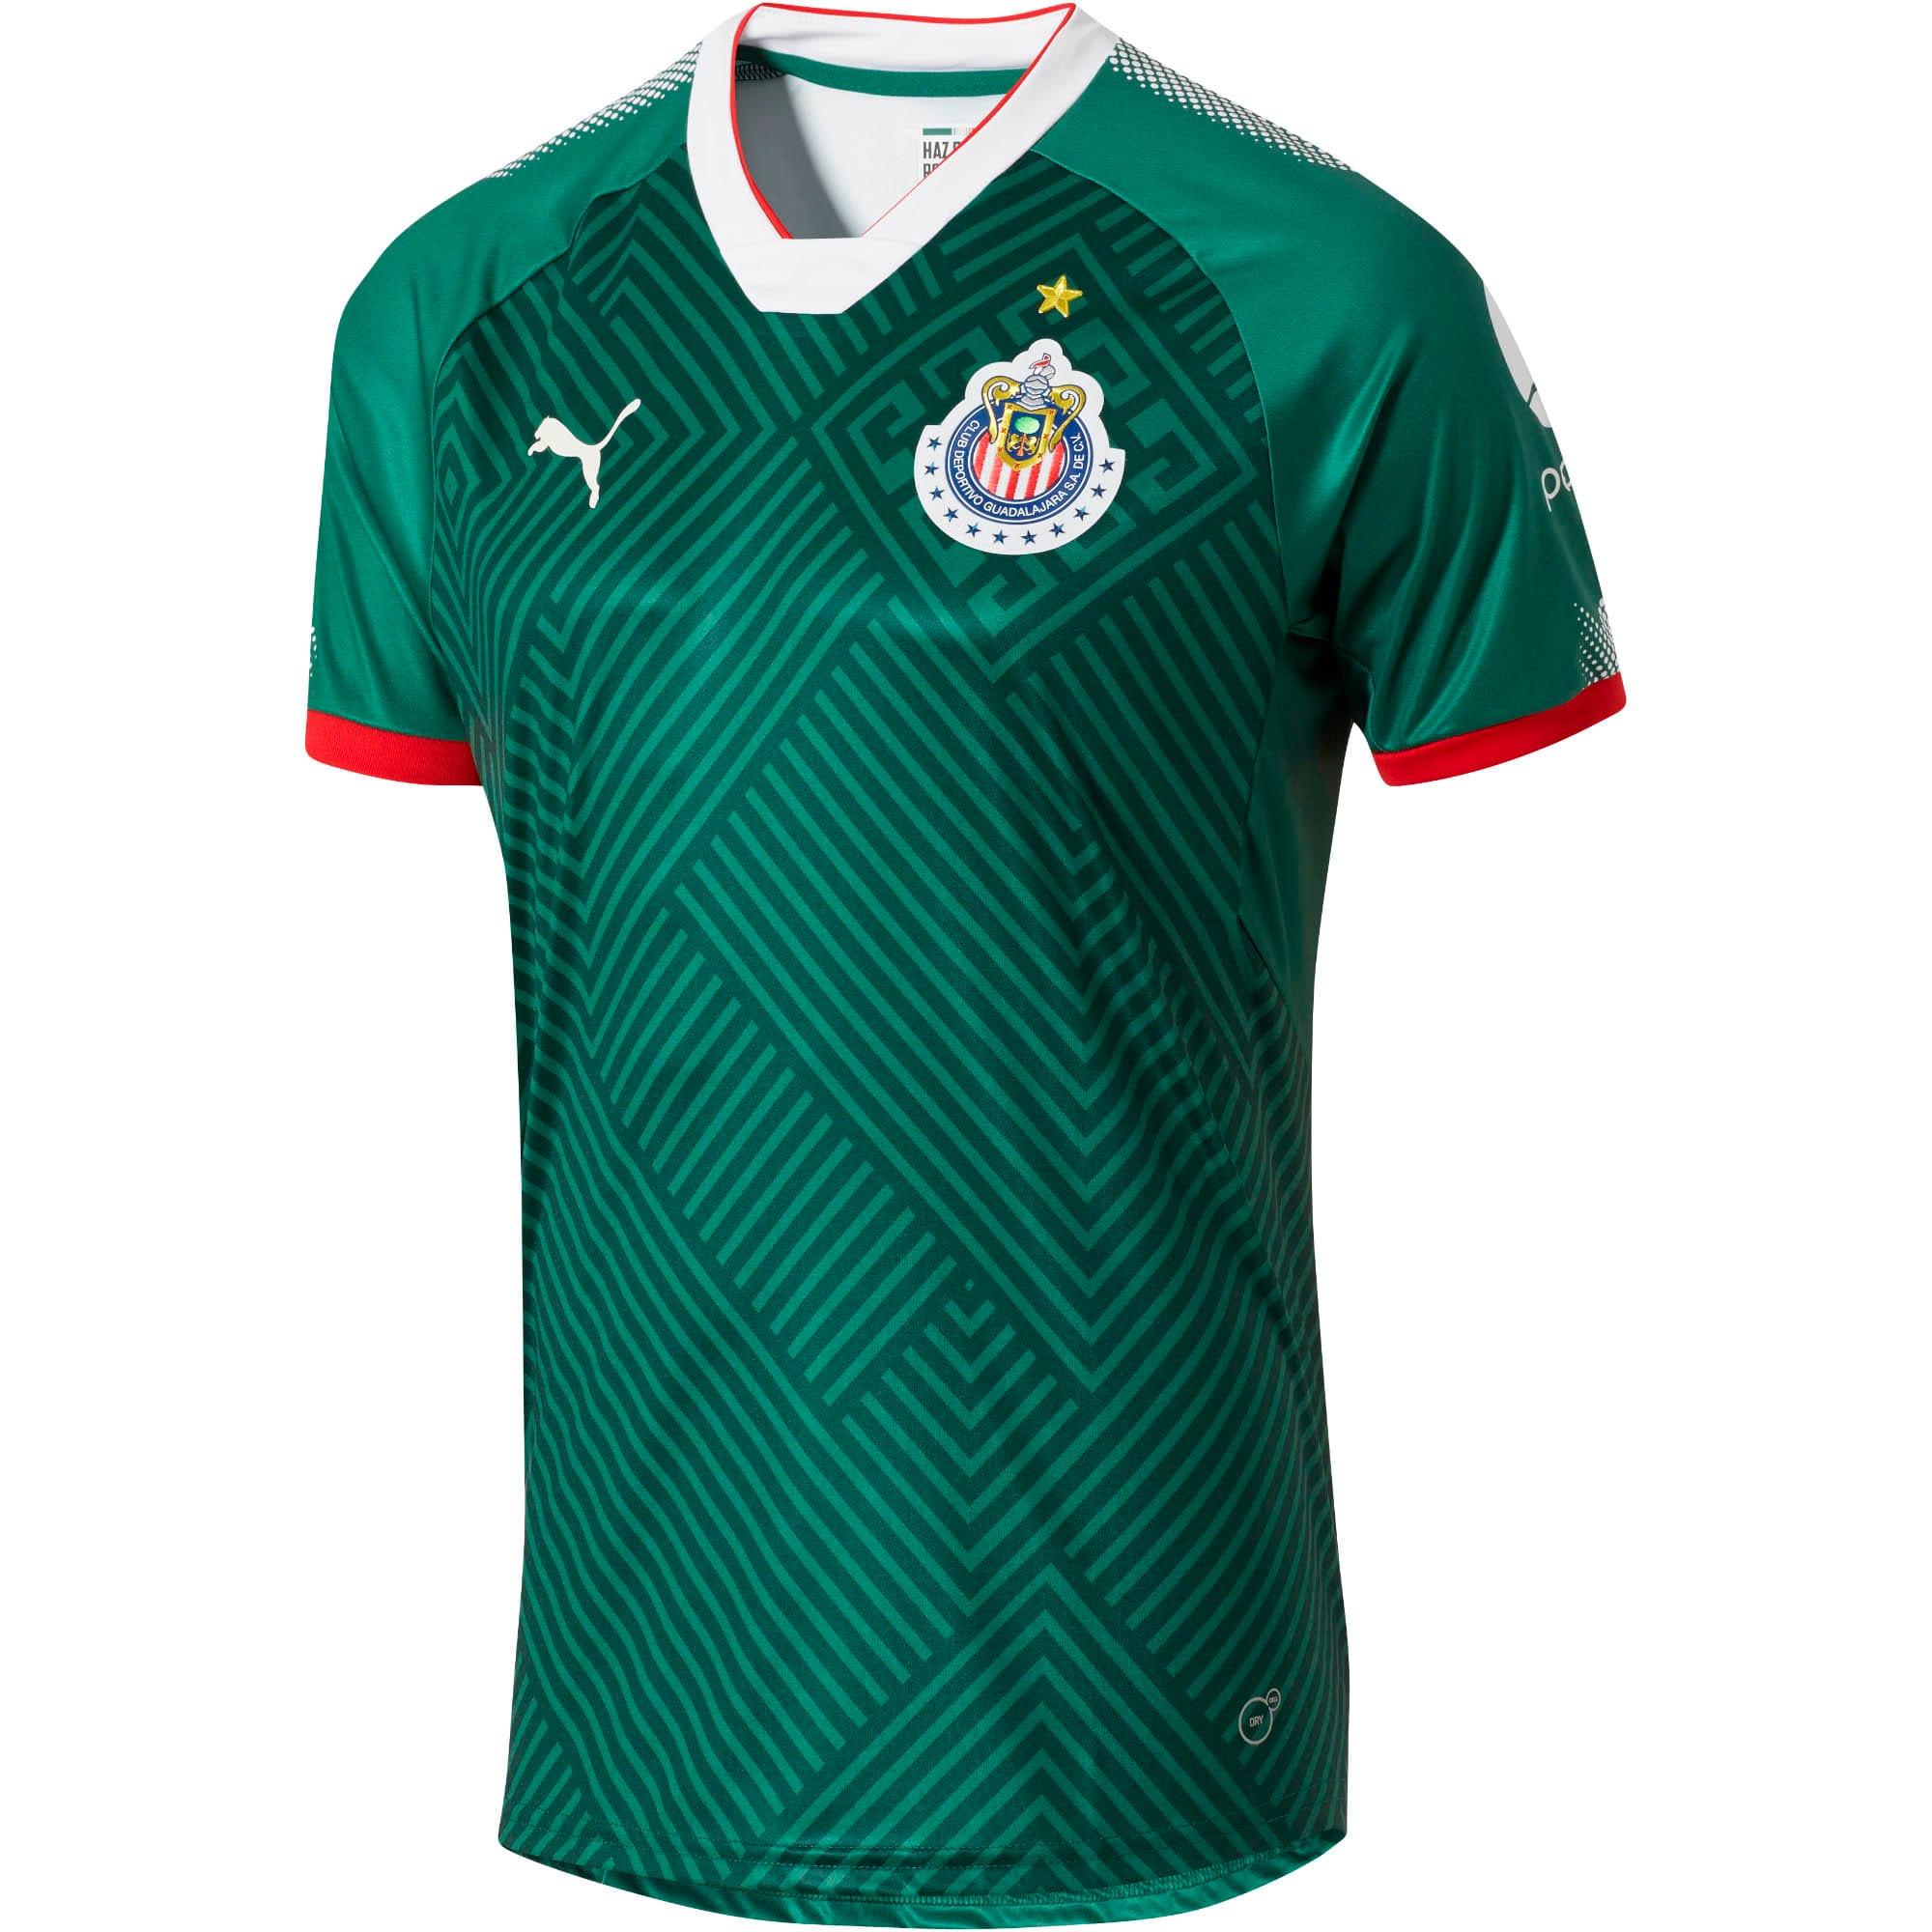 on sale 38398 b832e 2017/18 Chivas Third Replica Jersey